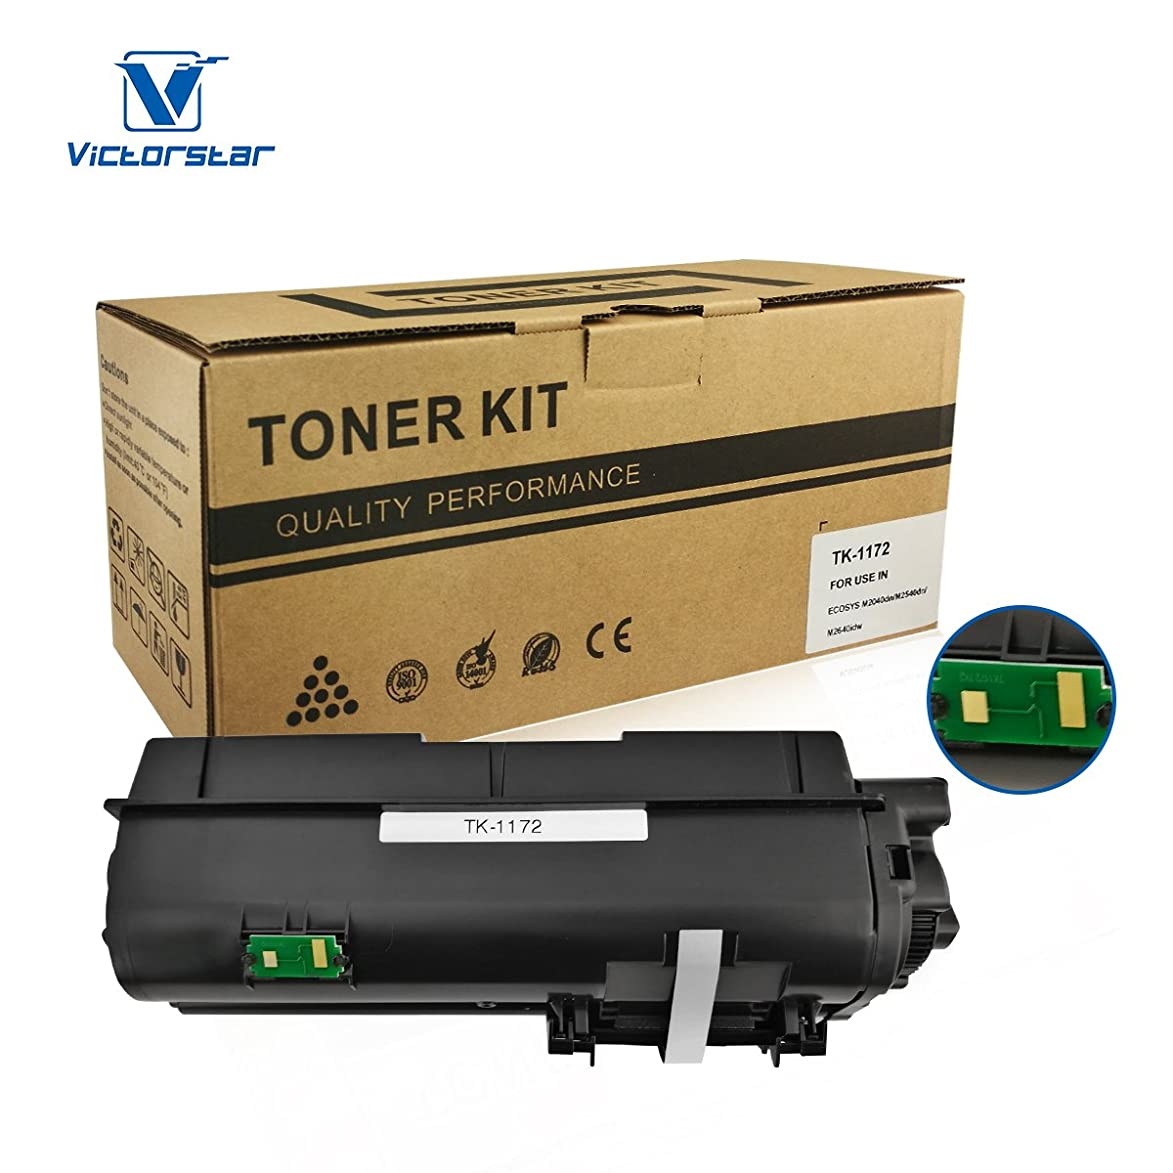 Compatible Toner Cartridge TK1172 / TK-1172 Black VICTORSTAR for Kyocera ECOSYS M2040dn M2540dn M2640idw Laser Printers